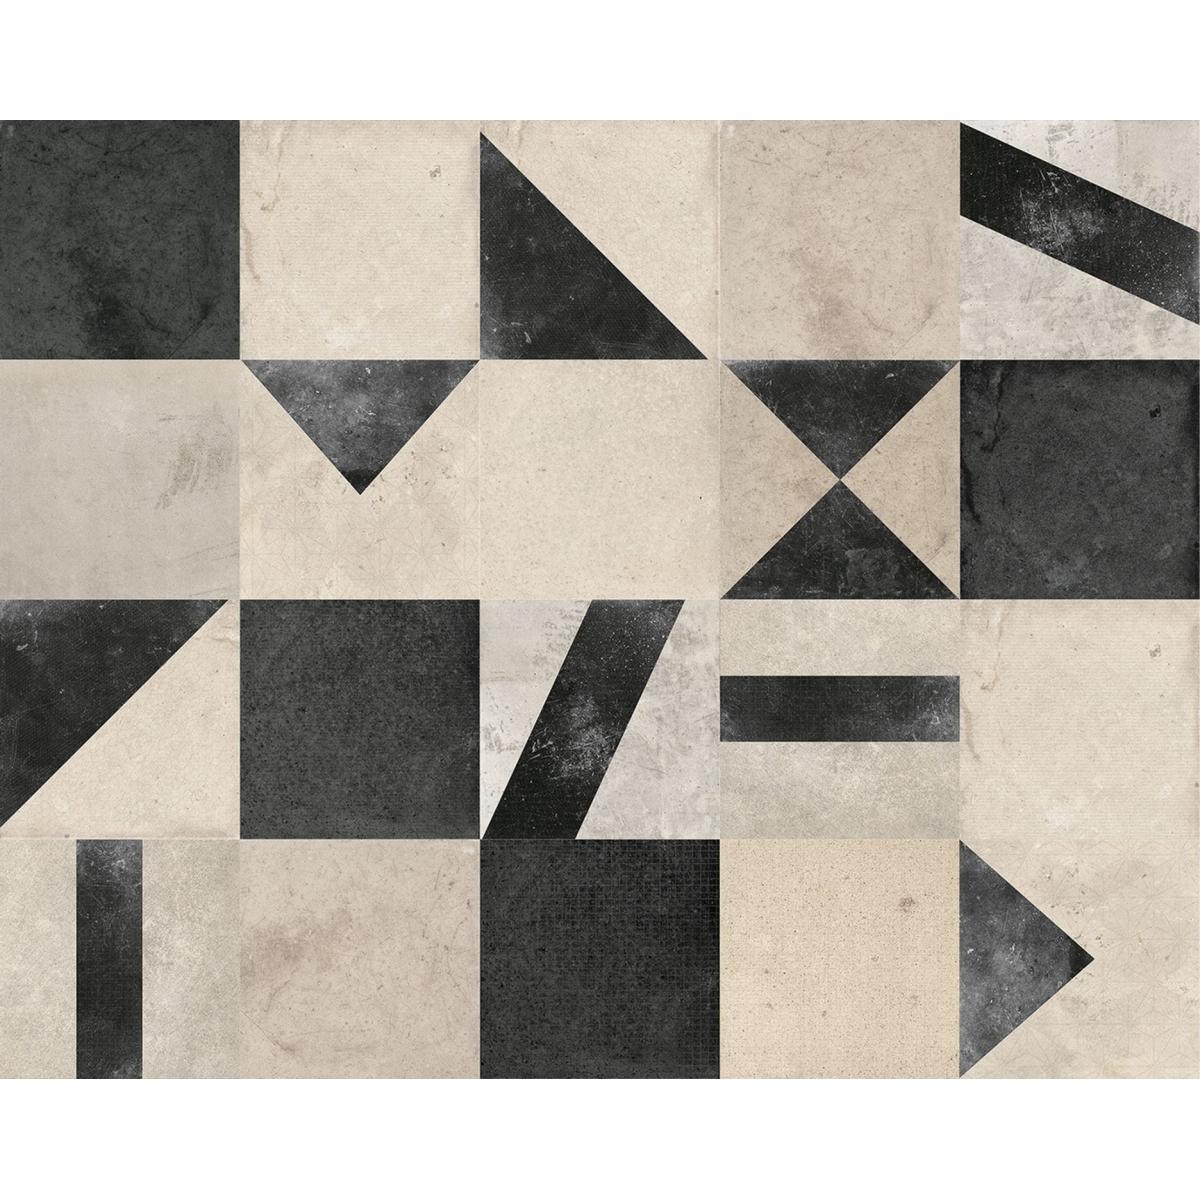 Comprar online Vinci Mix 25x25 (m2)